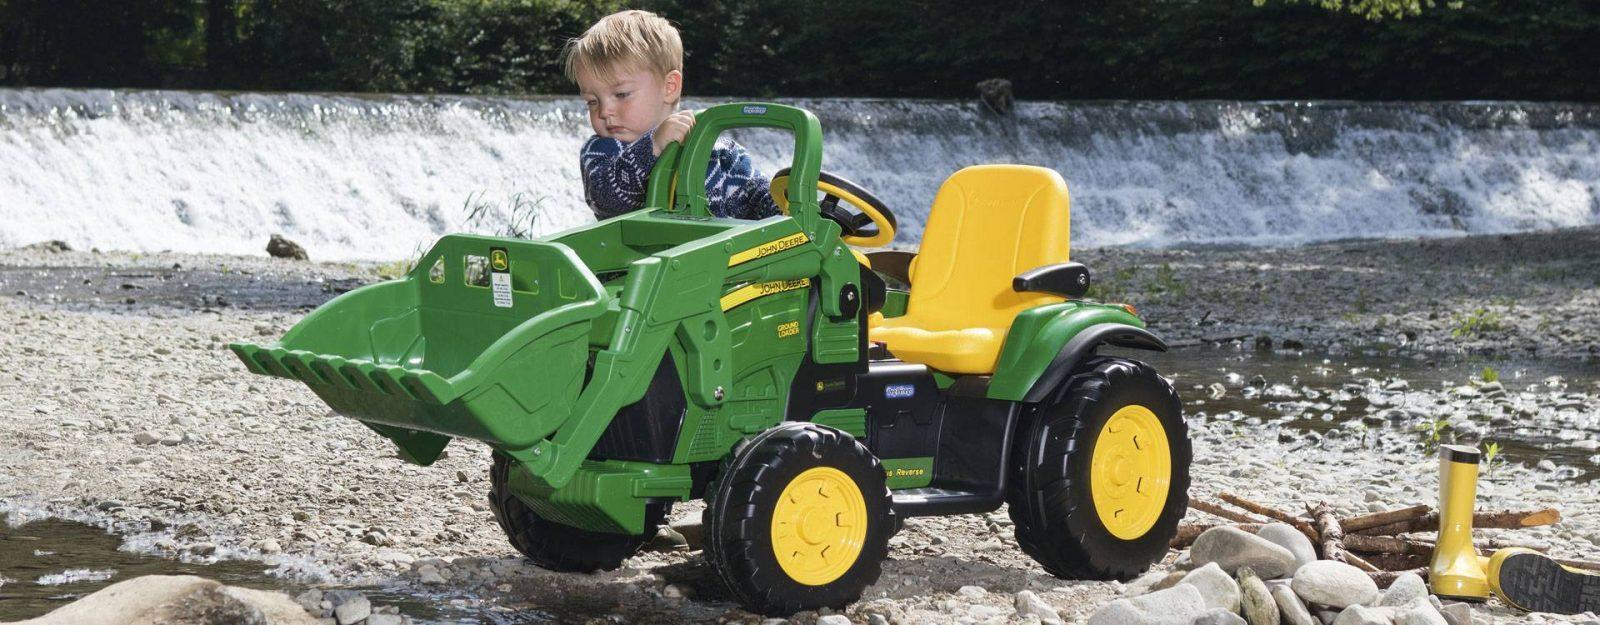 otroski-traktor-pegperego-1